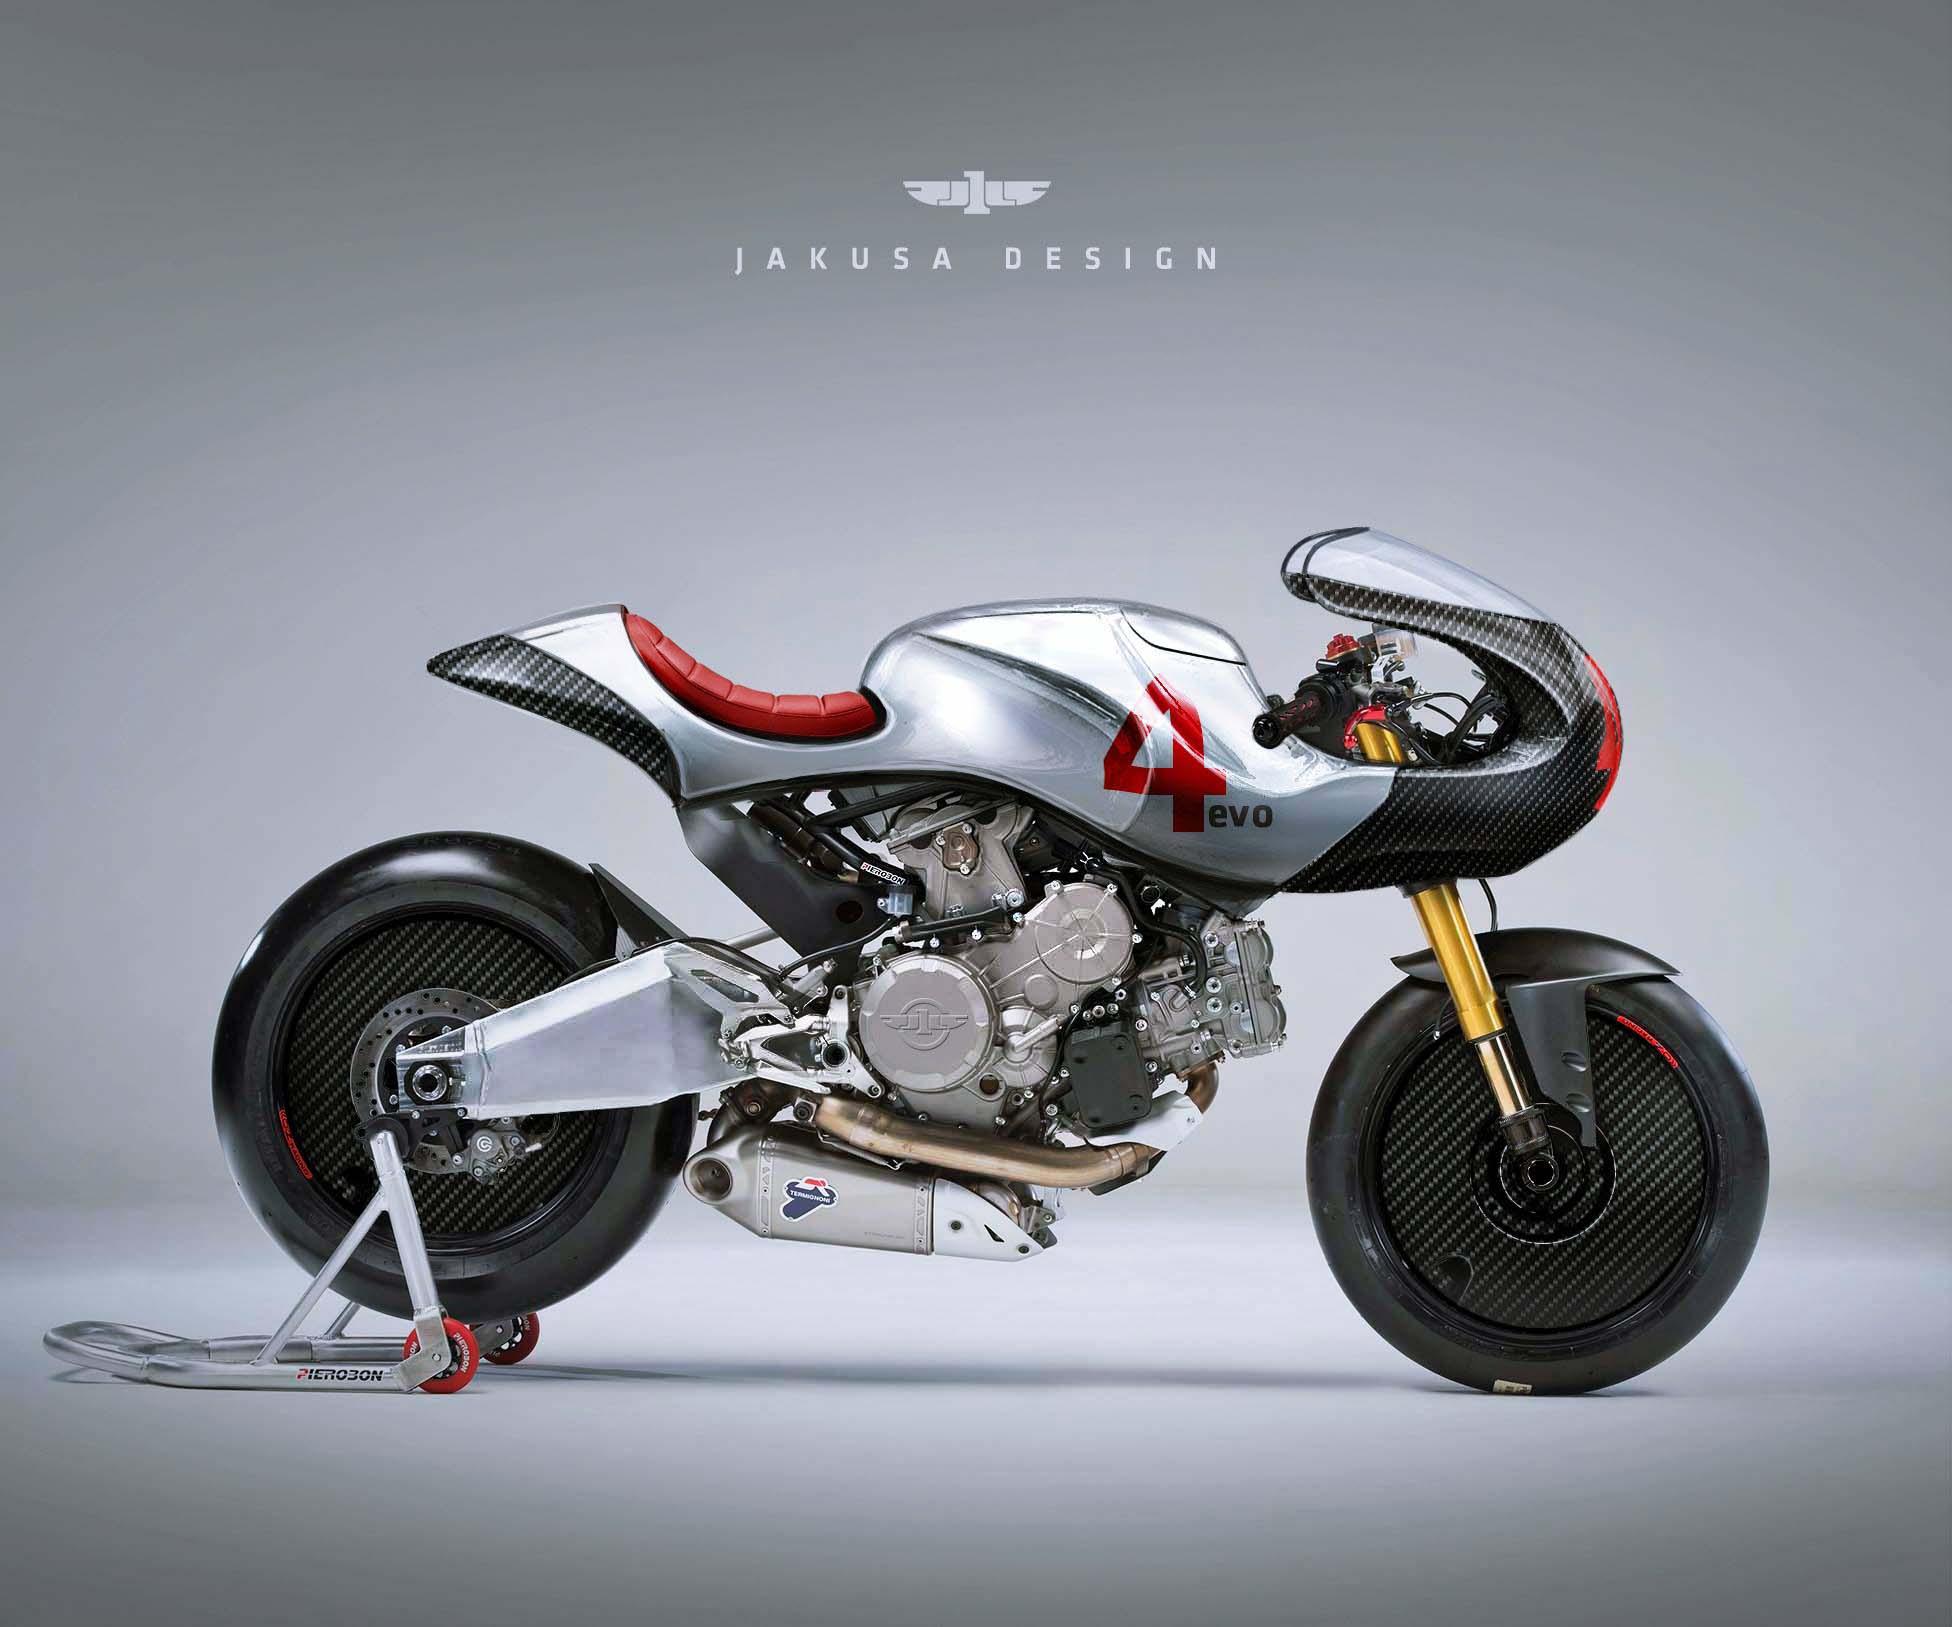 Jakusa-Ducati-Photoshop-concept-02.jpg